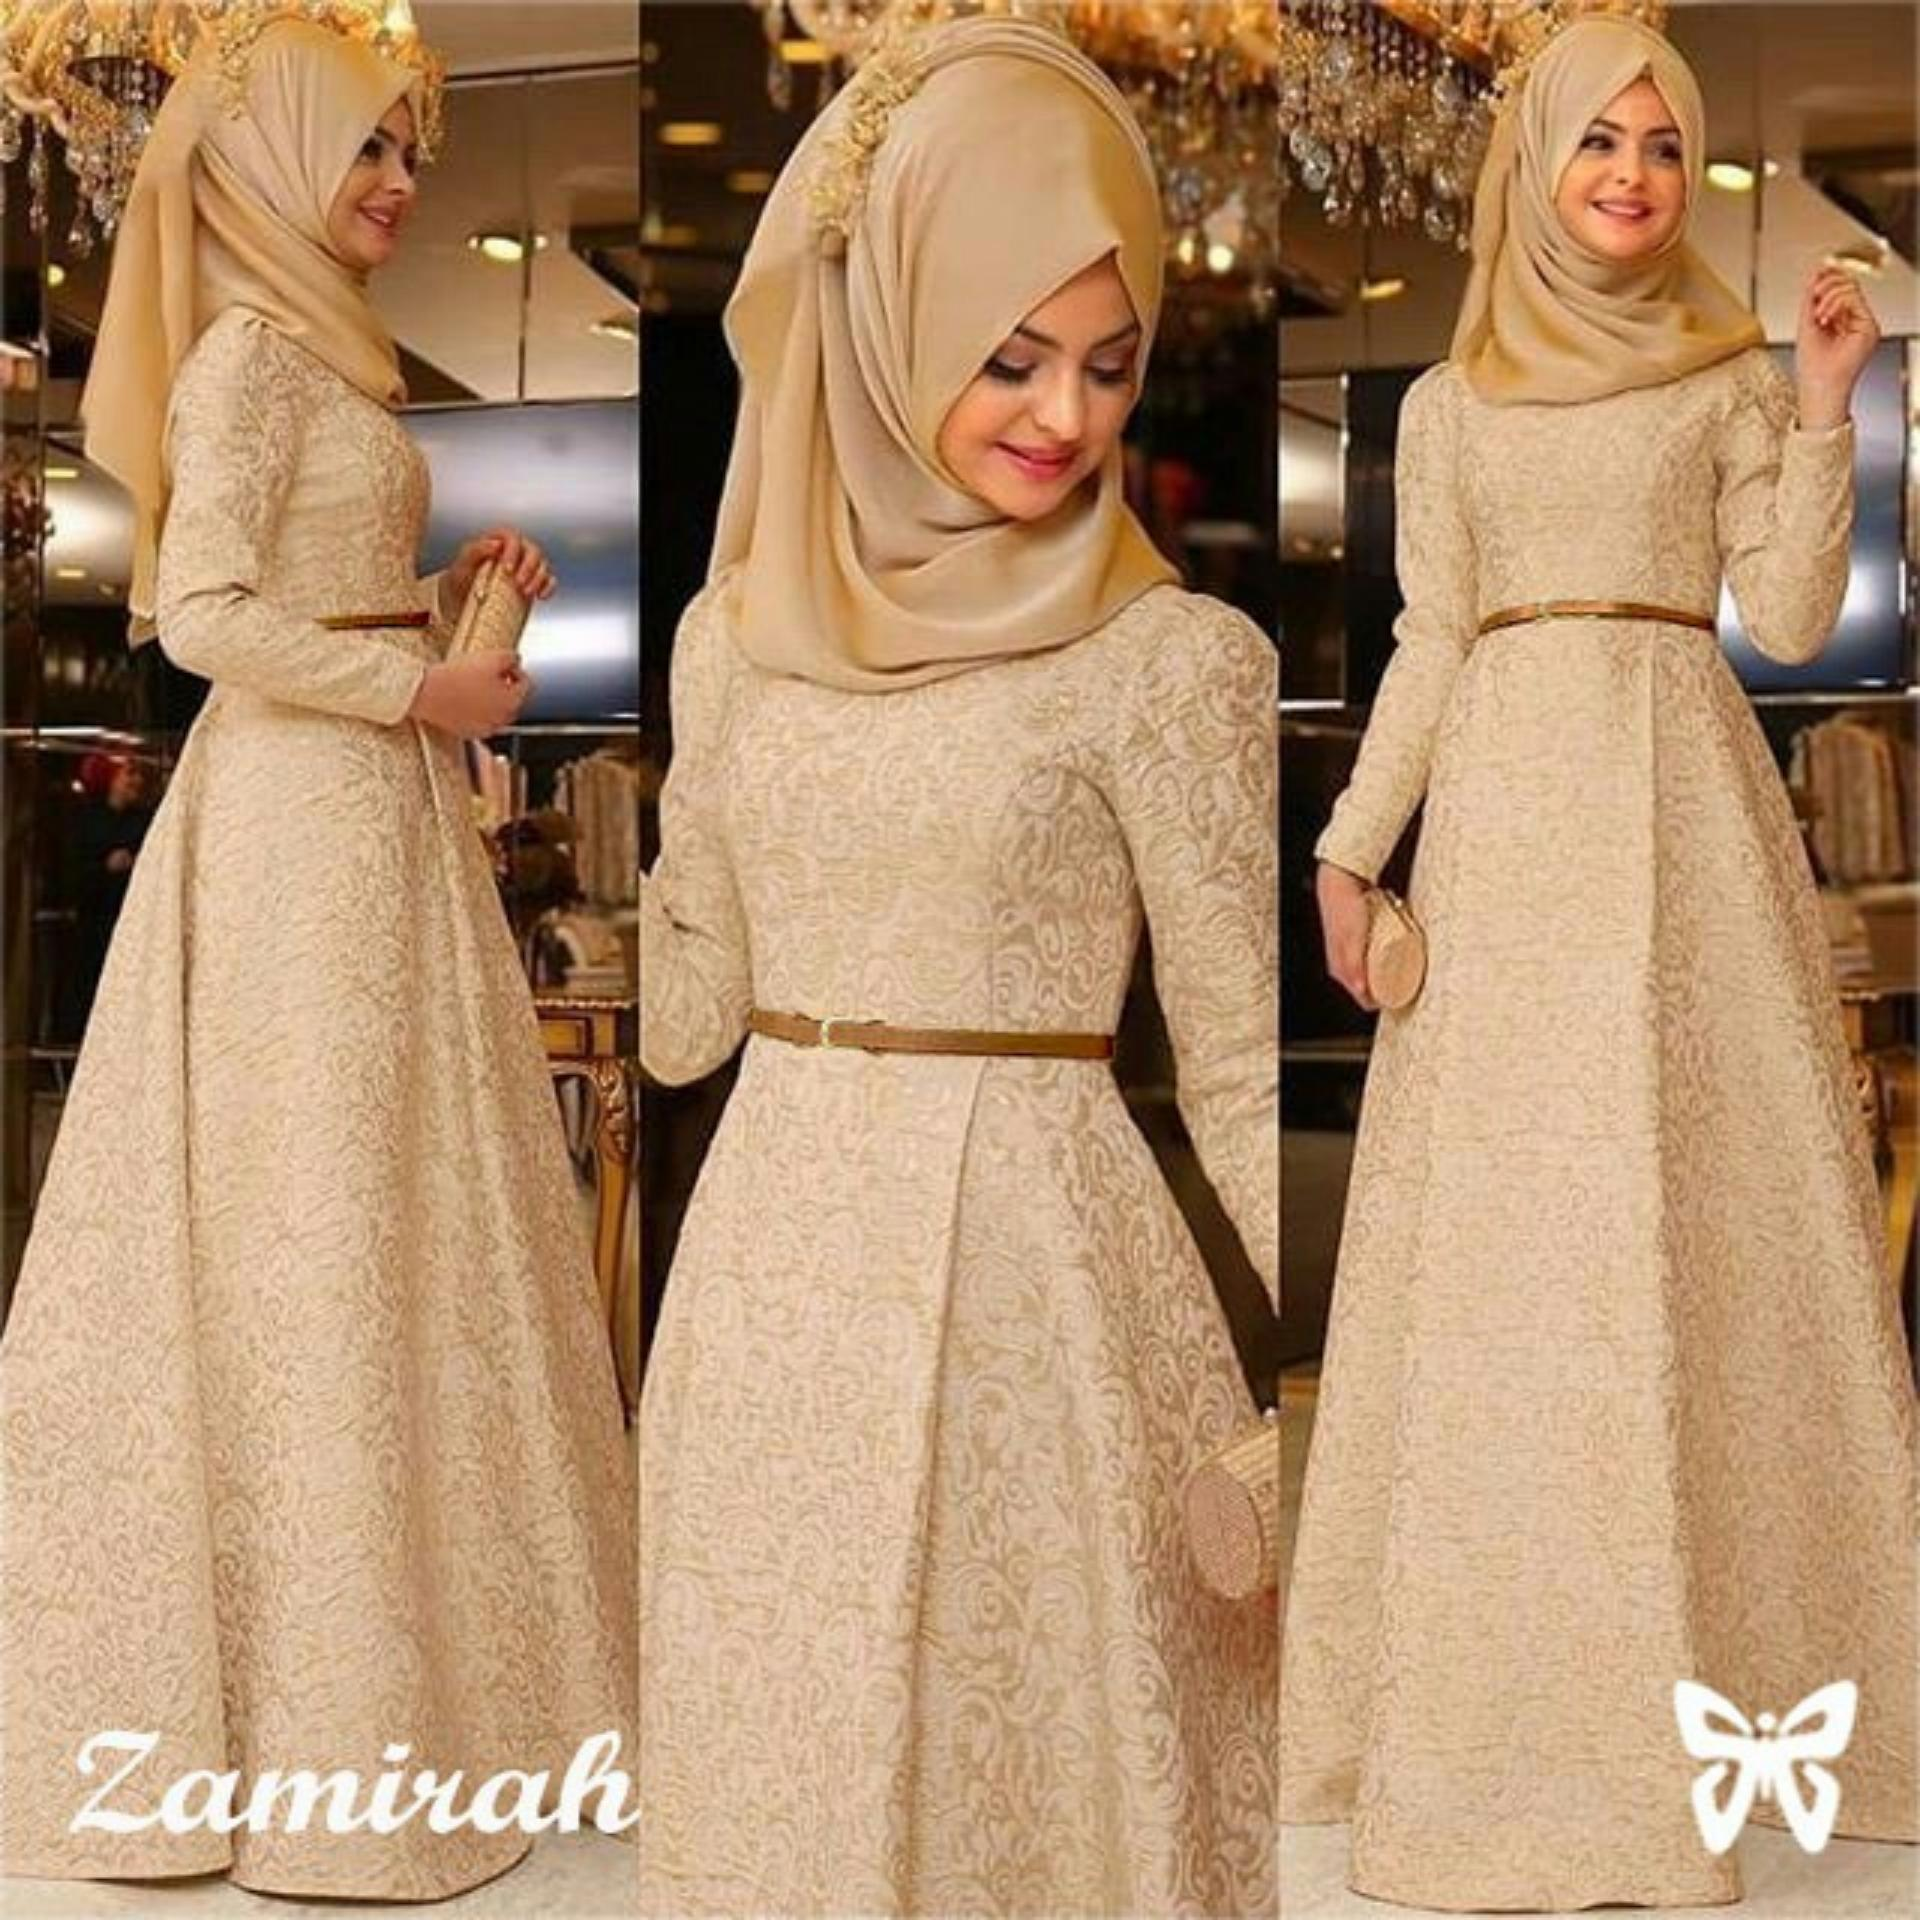 gamis   dress gamis muslim mirah / hijab muslim / muslim syari hijab syari / busana muslimah / kebaya modern lebaran (mirahza)  ss – mocca / gaun pesta lengan panjang